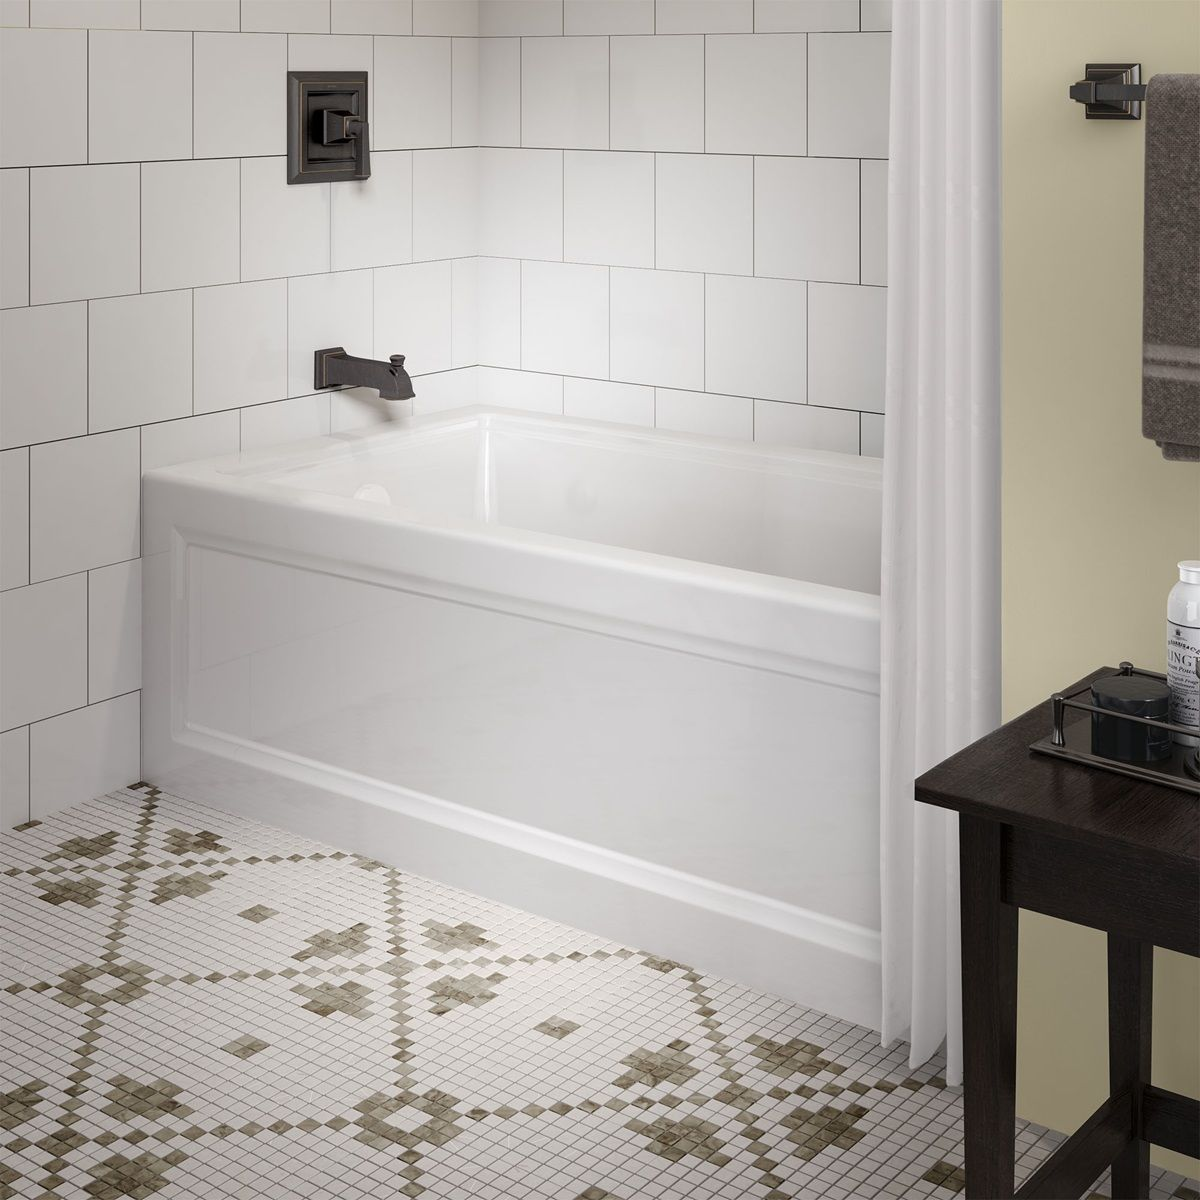 Town Square S 60x32-inch Bathtub | American Standard ...